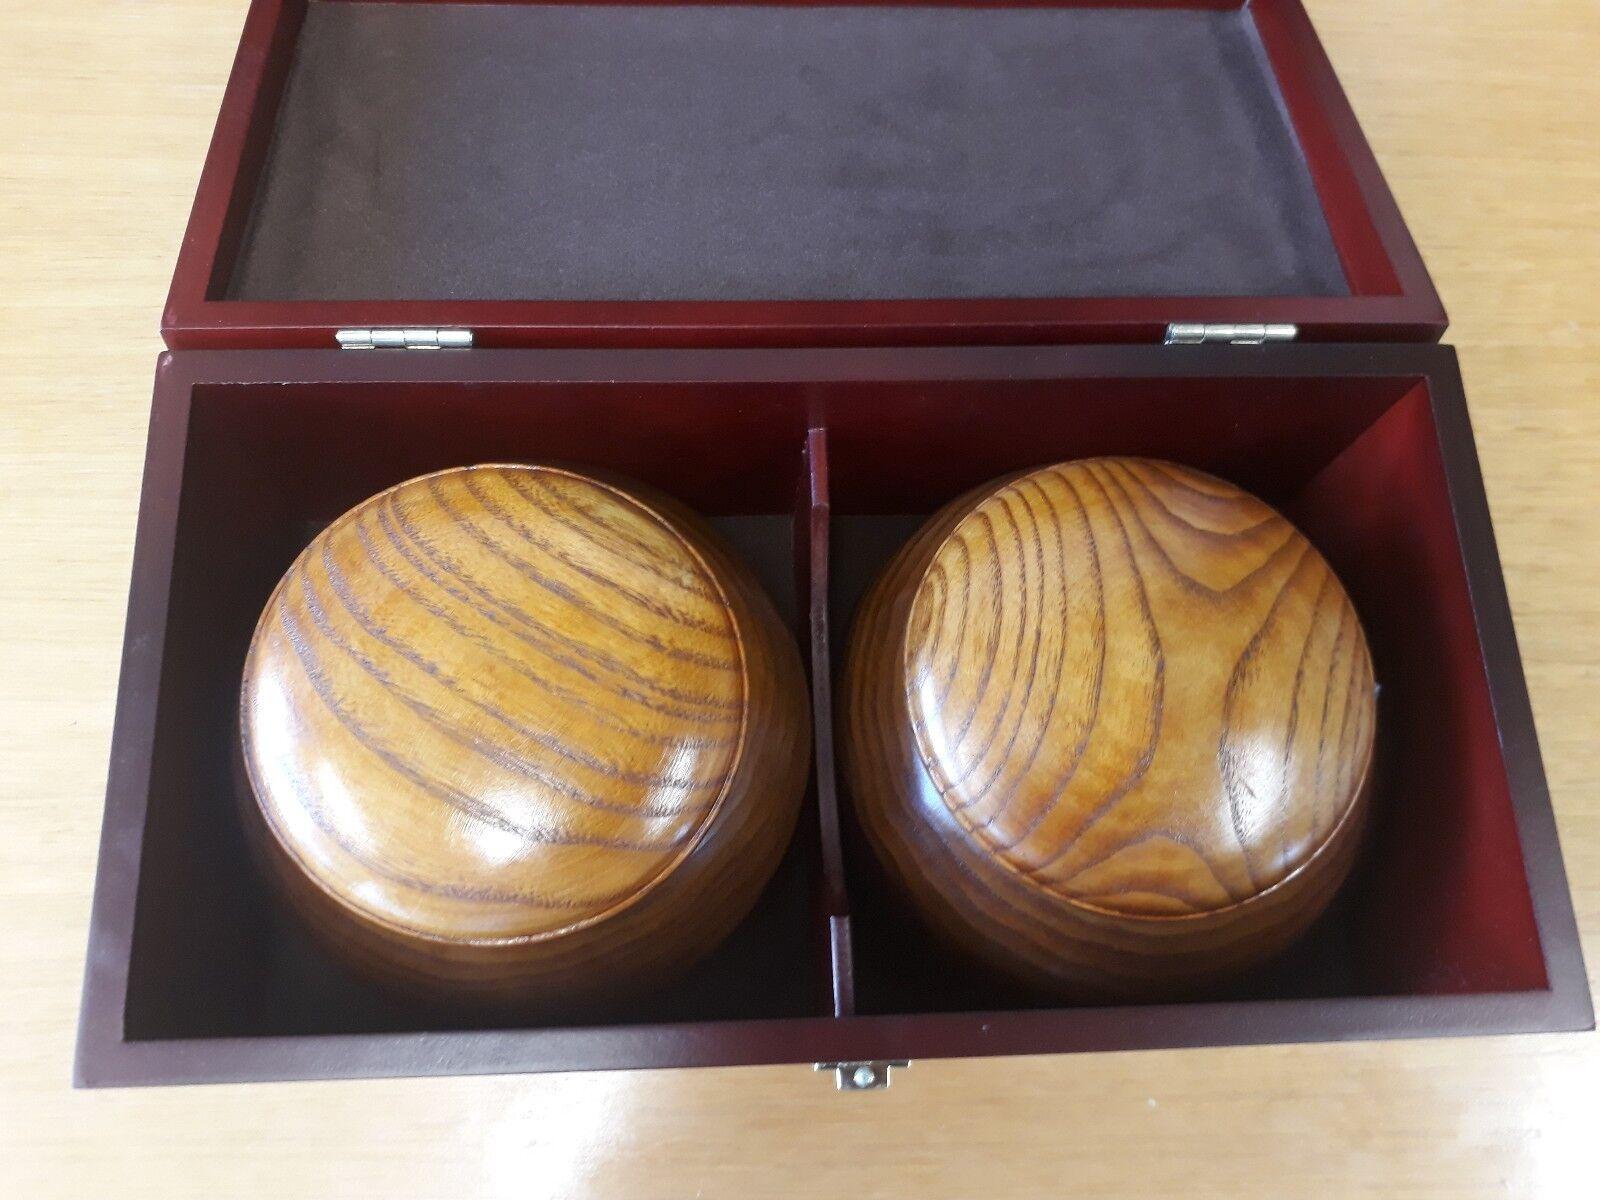 Biconvex Stones, Jujube Bowls e scatola